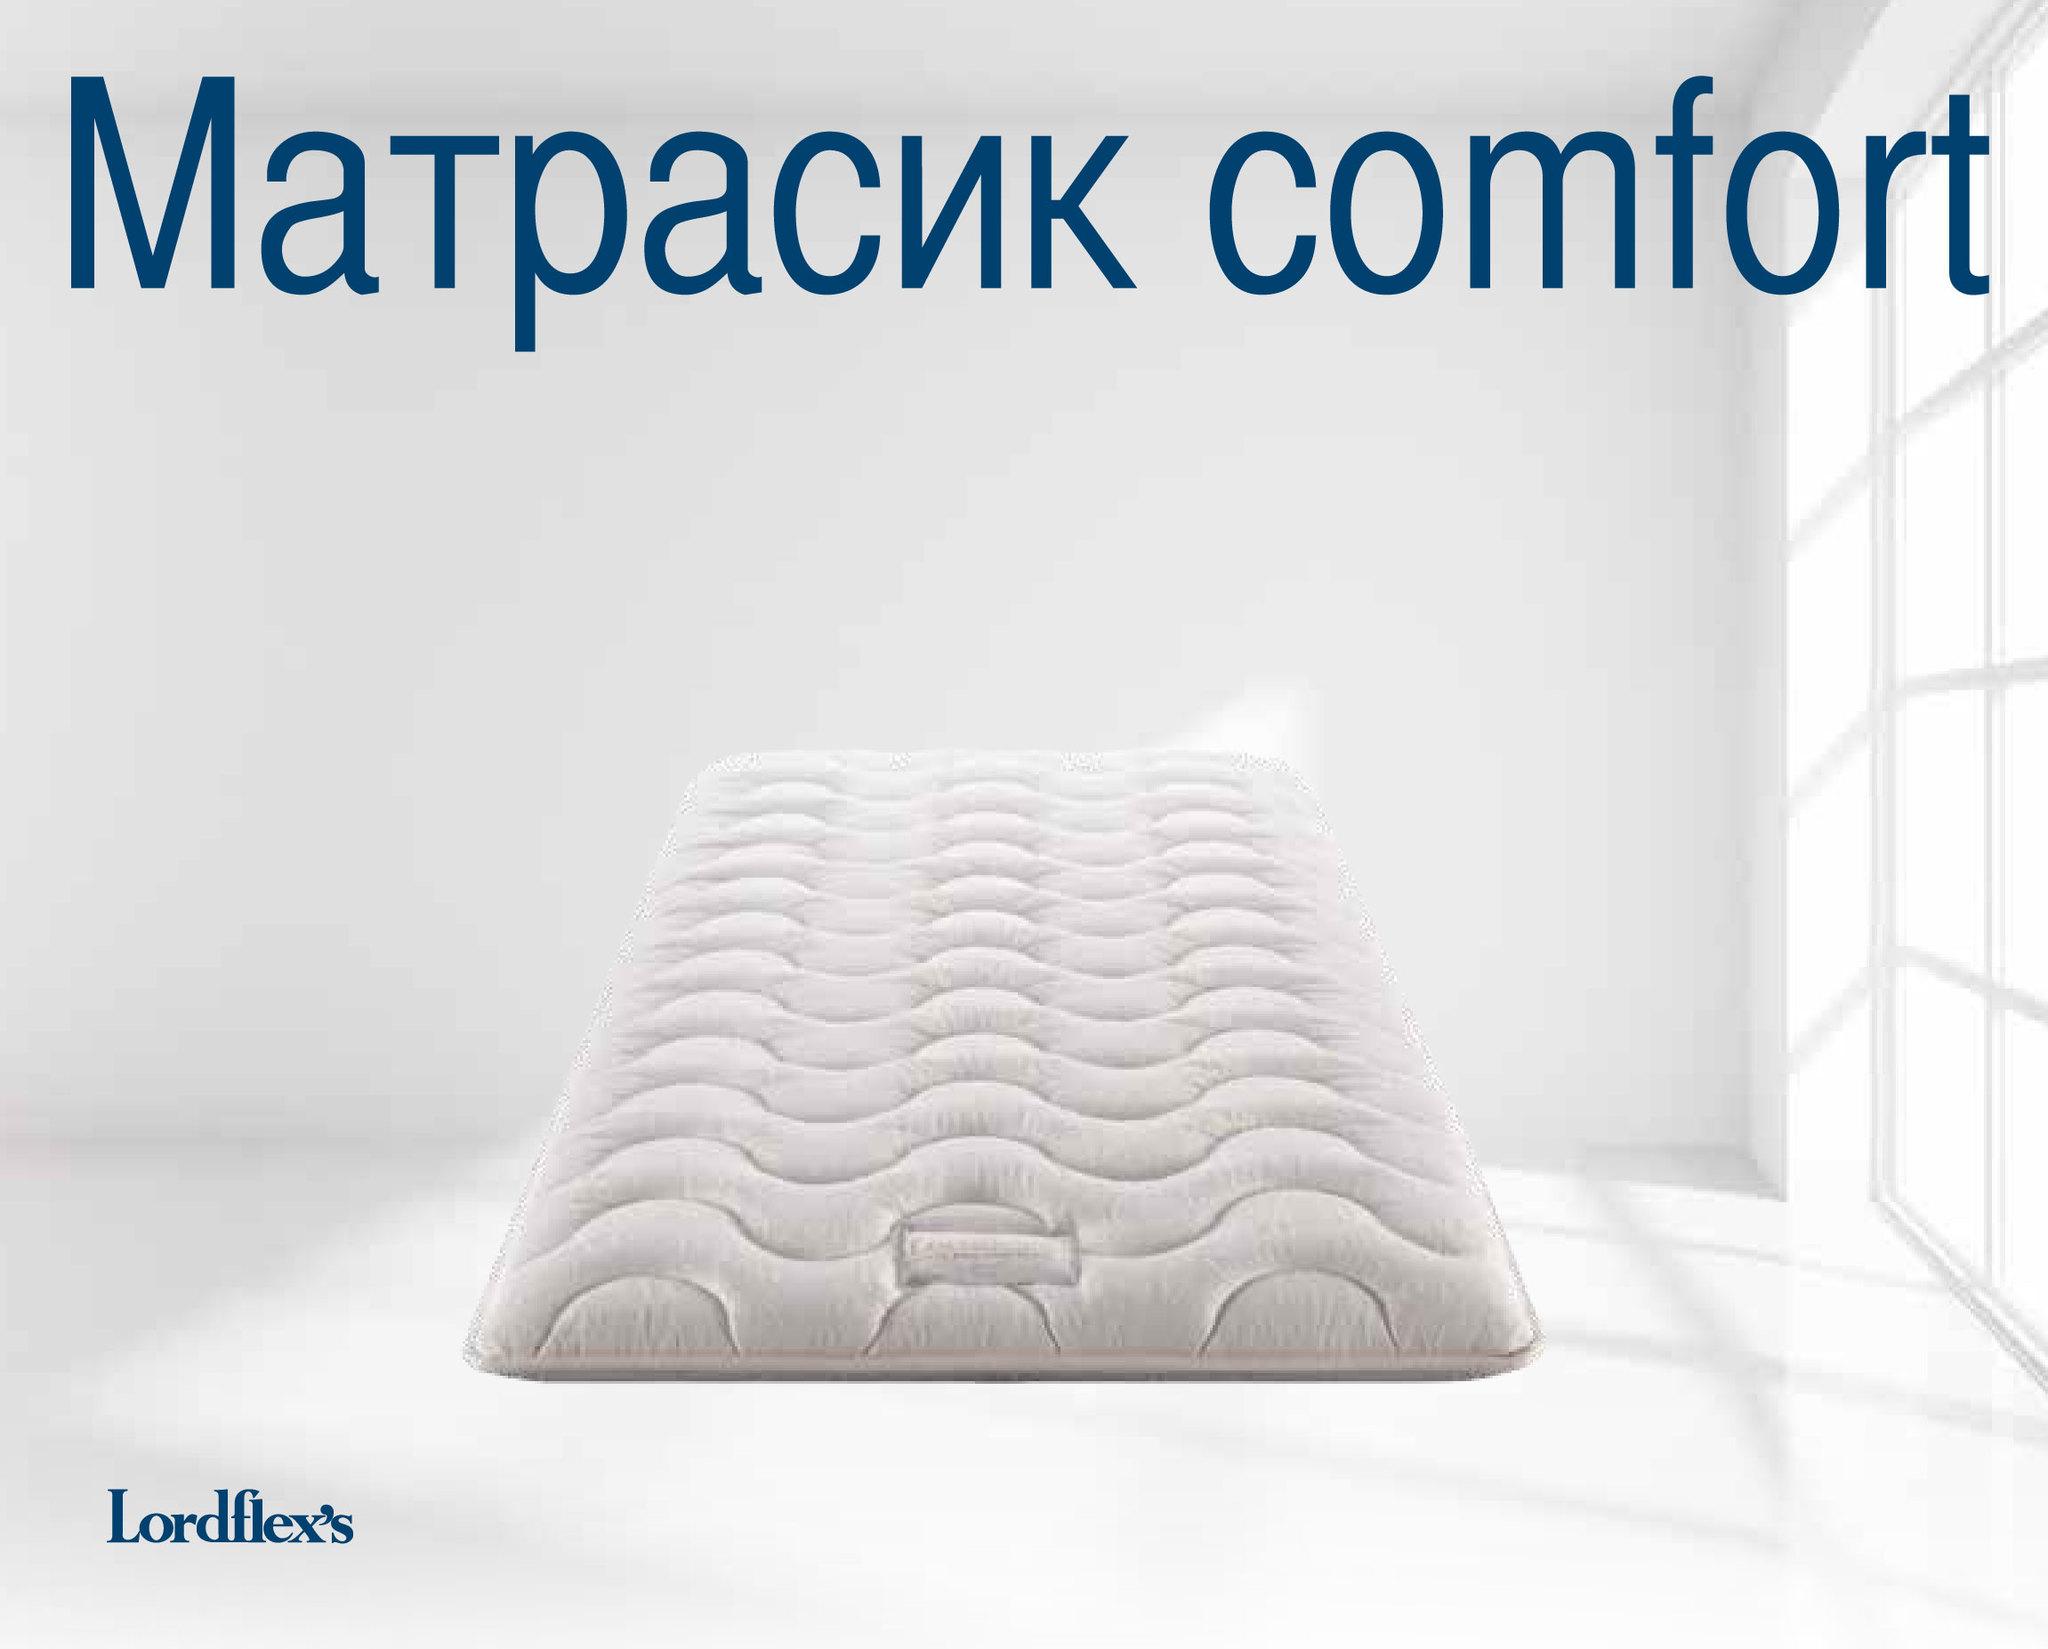 Матрасы Матрасик ортопедический 170х200 Lordflex's Comfort Memory Materassino-Comfort.jpg